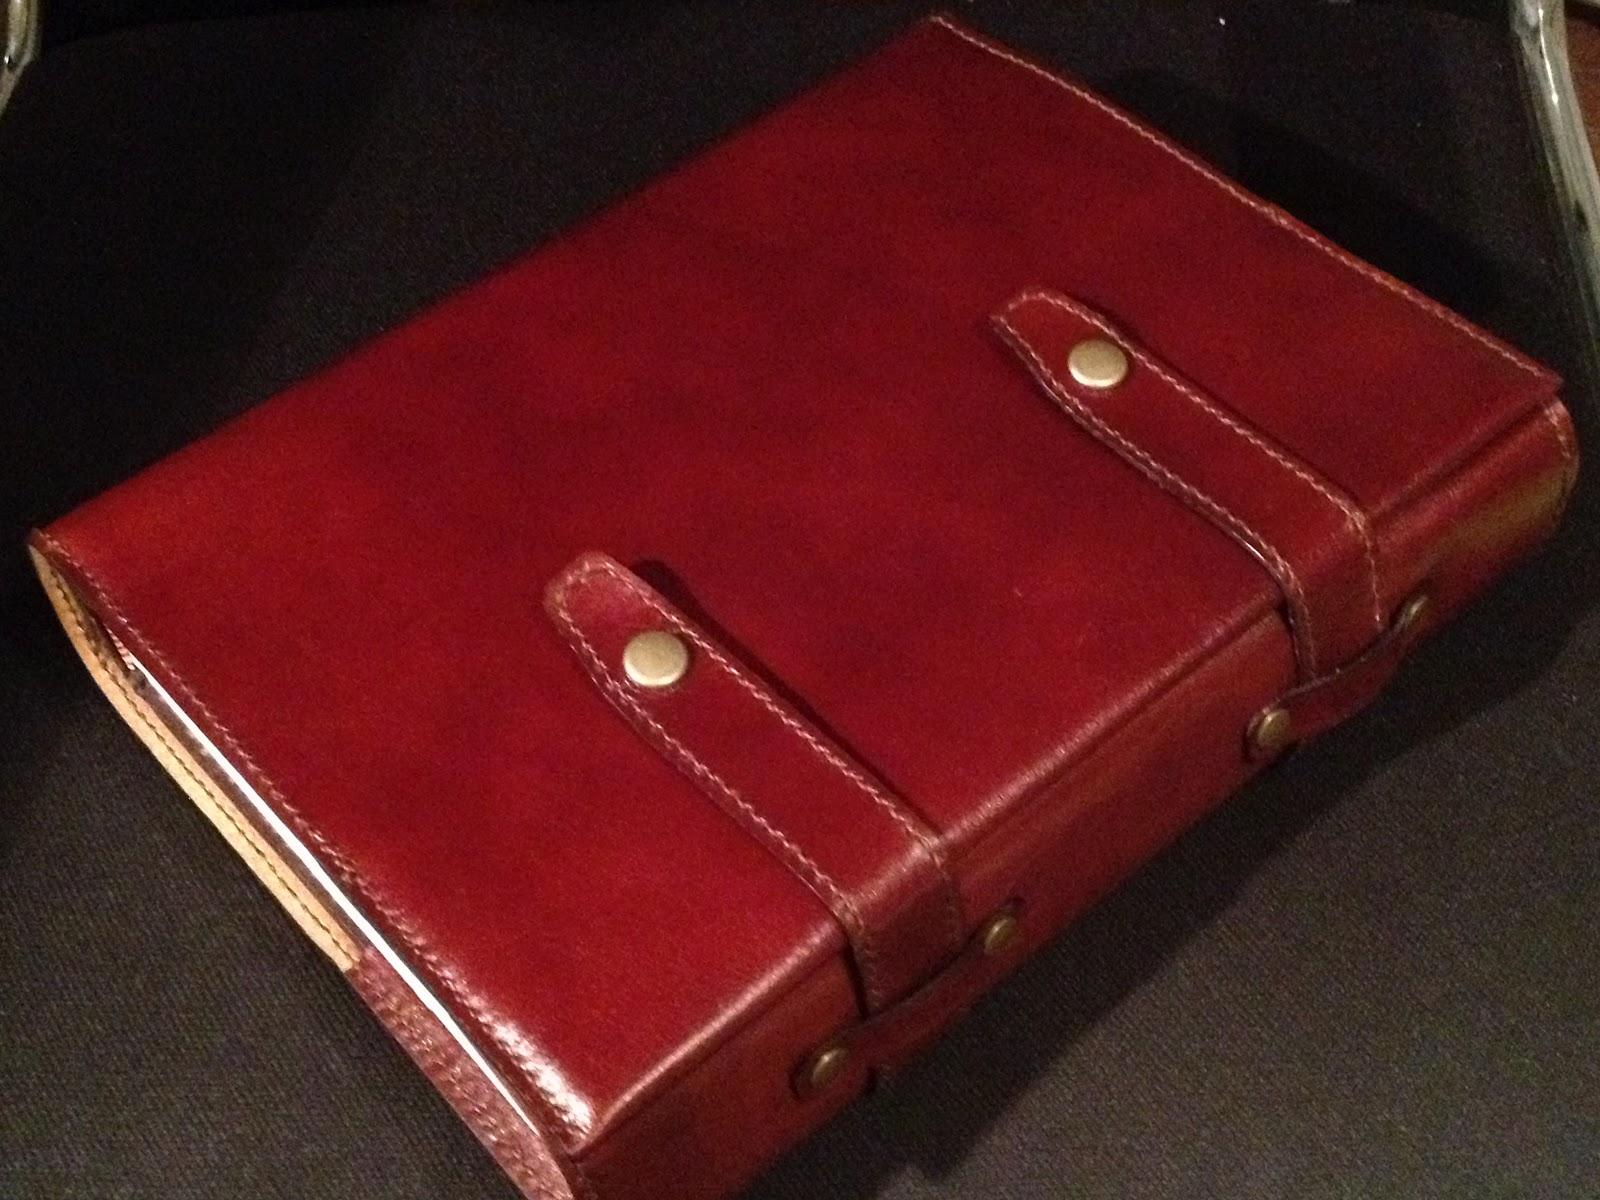 Cinq Craft: イタリアン・カーフレザーの聖書カバー。 Cin...  イタリアン・カー